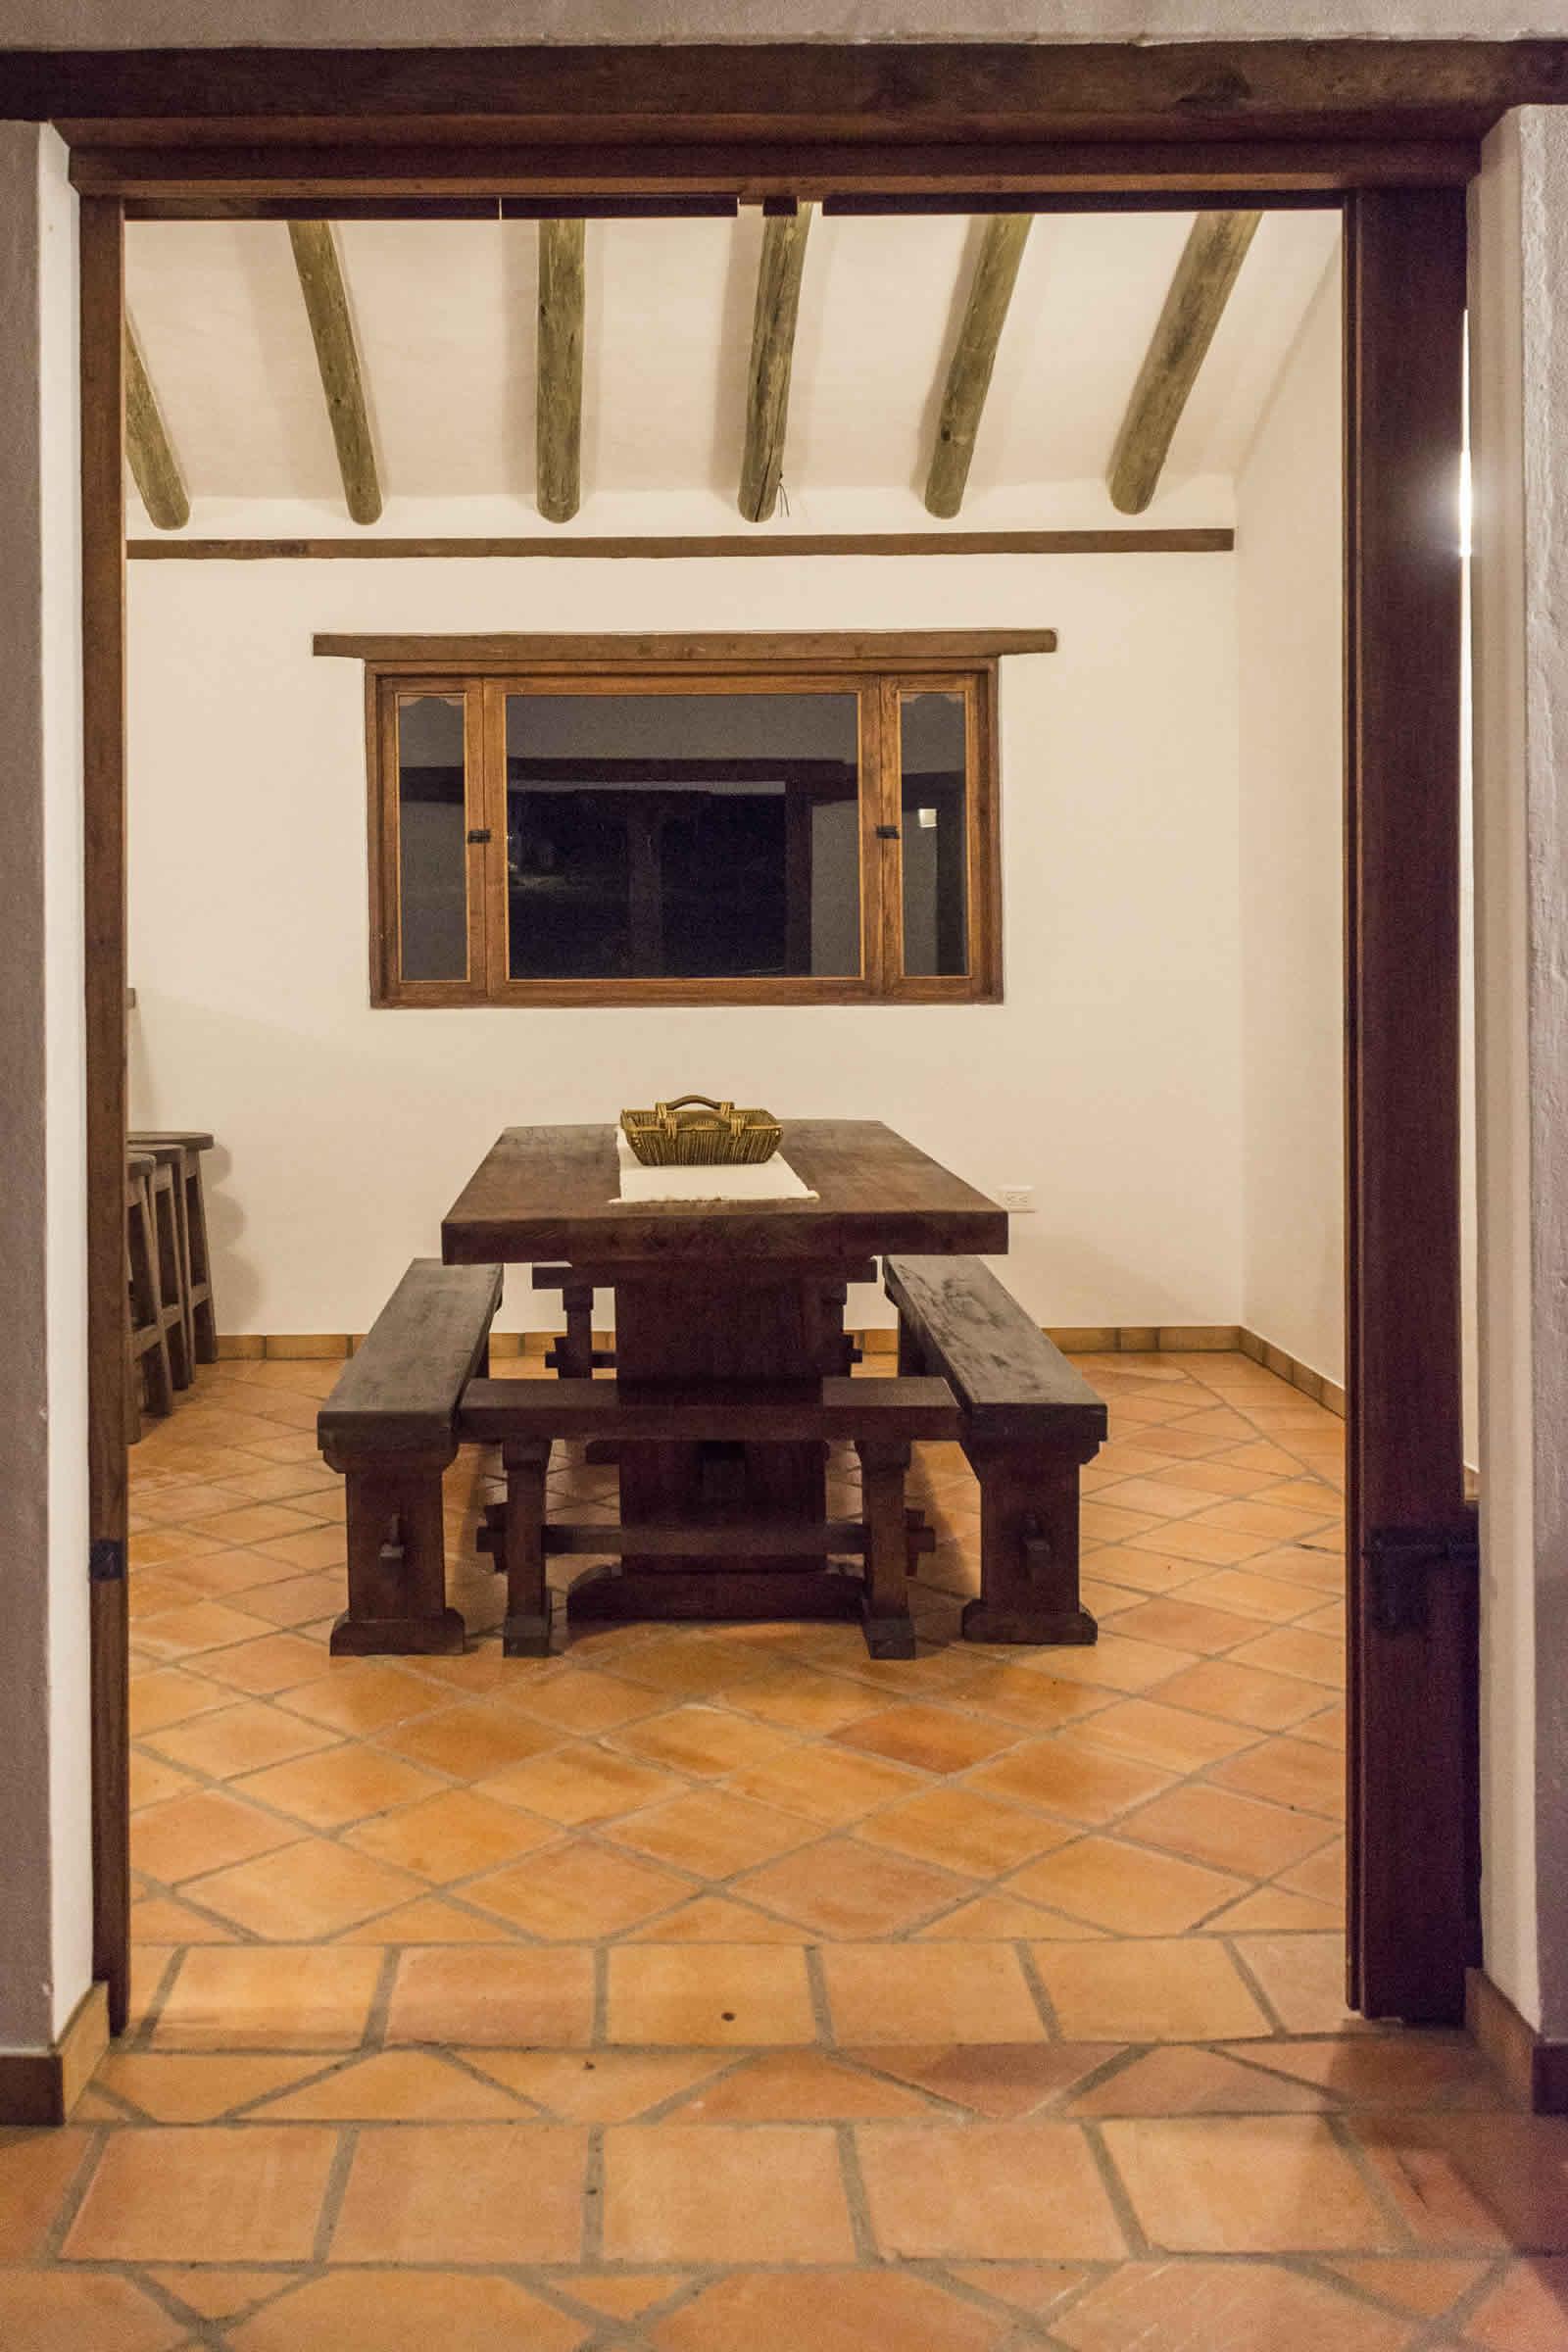 Alquiler casa de Ritoque en Villa de Leyva - Comedor